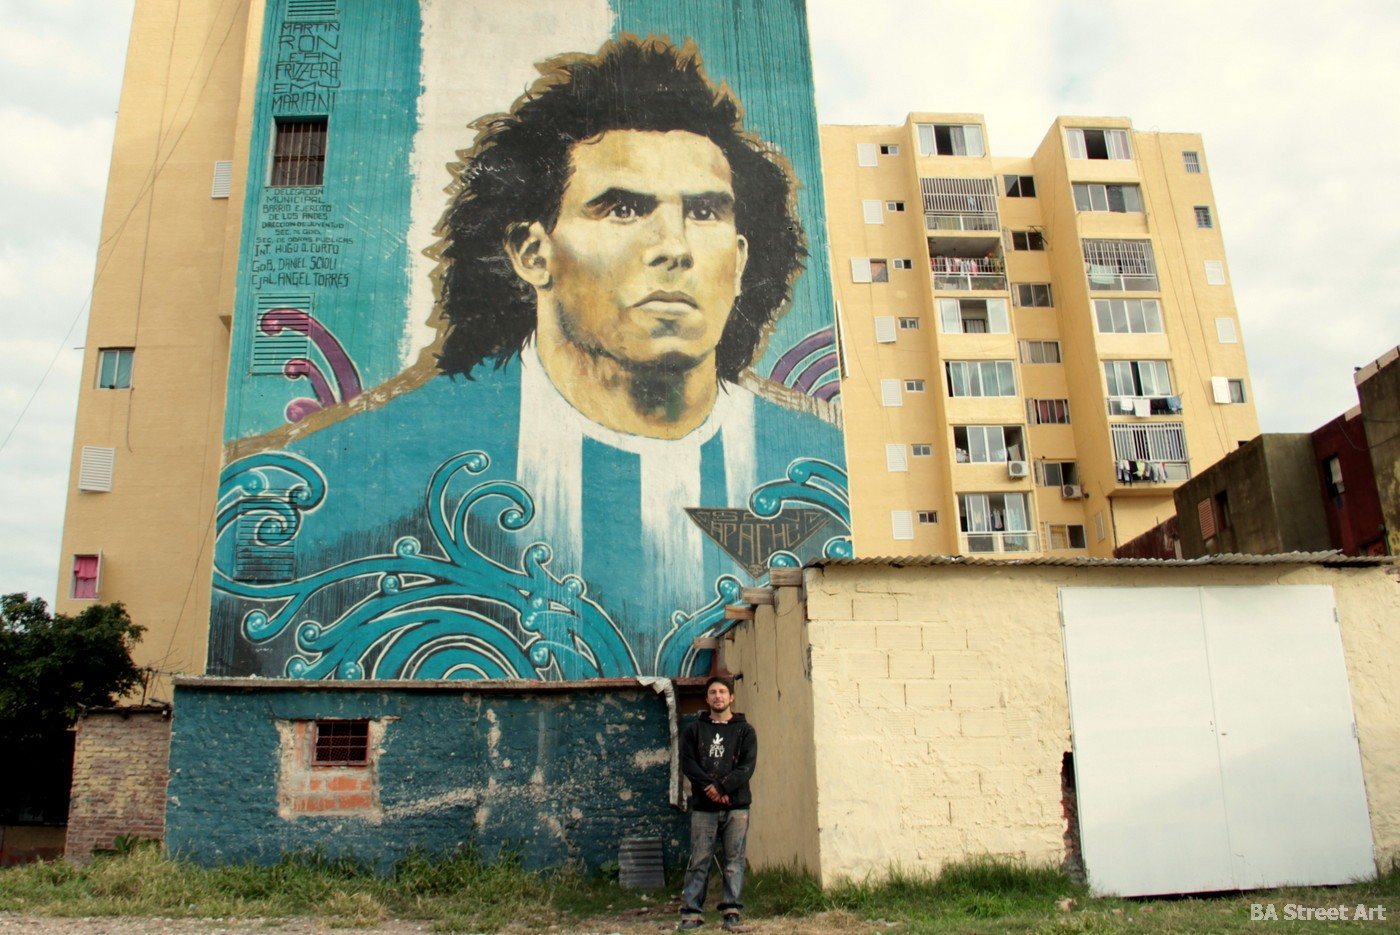 fuerte apache carlitos tevez buenos aires mural argentina futbol footballer boca juniors buenos aires street art buenosairesstreetart.com